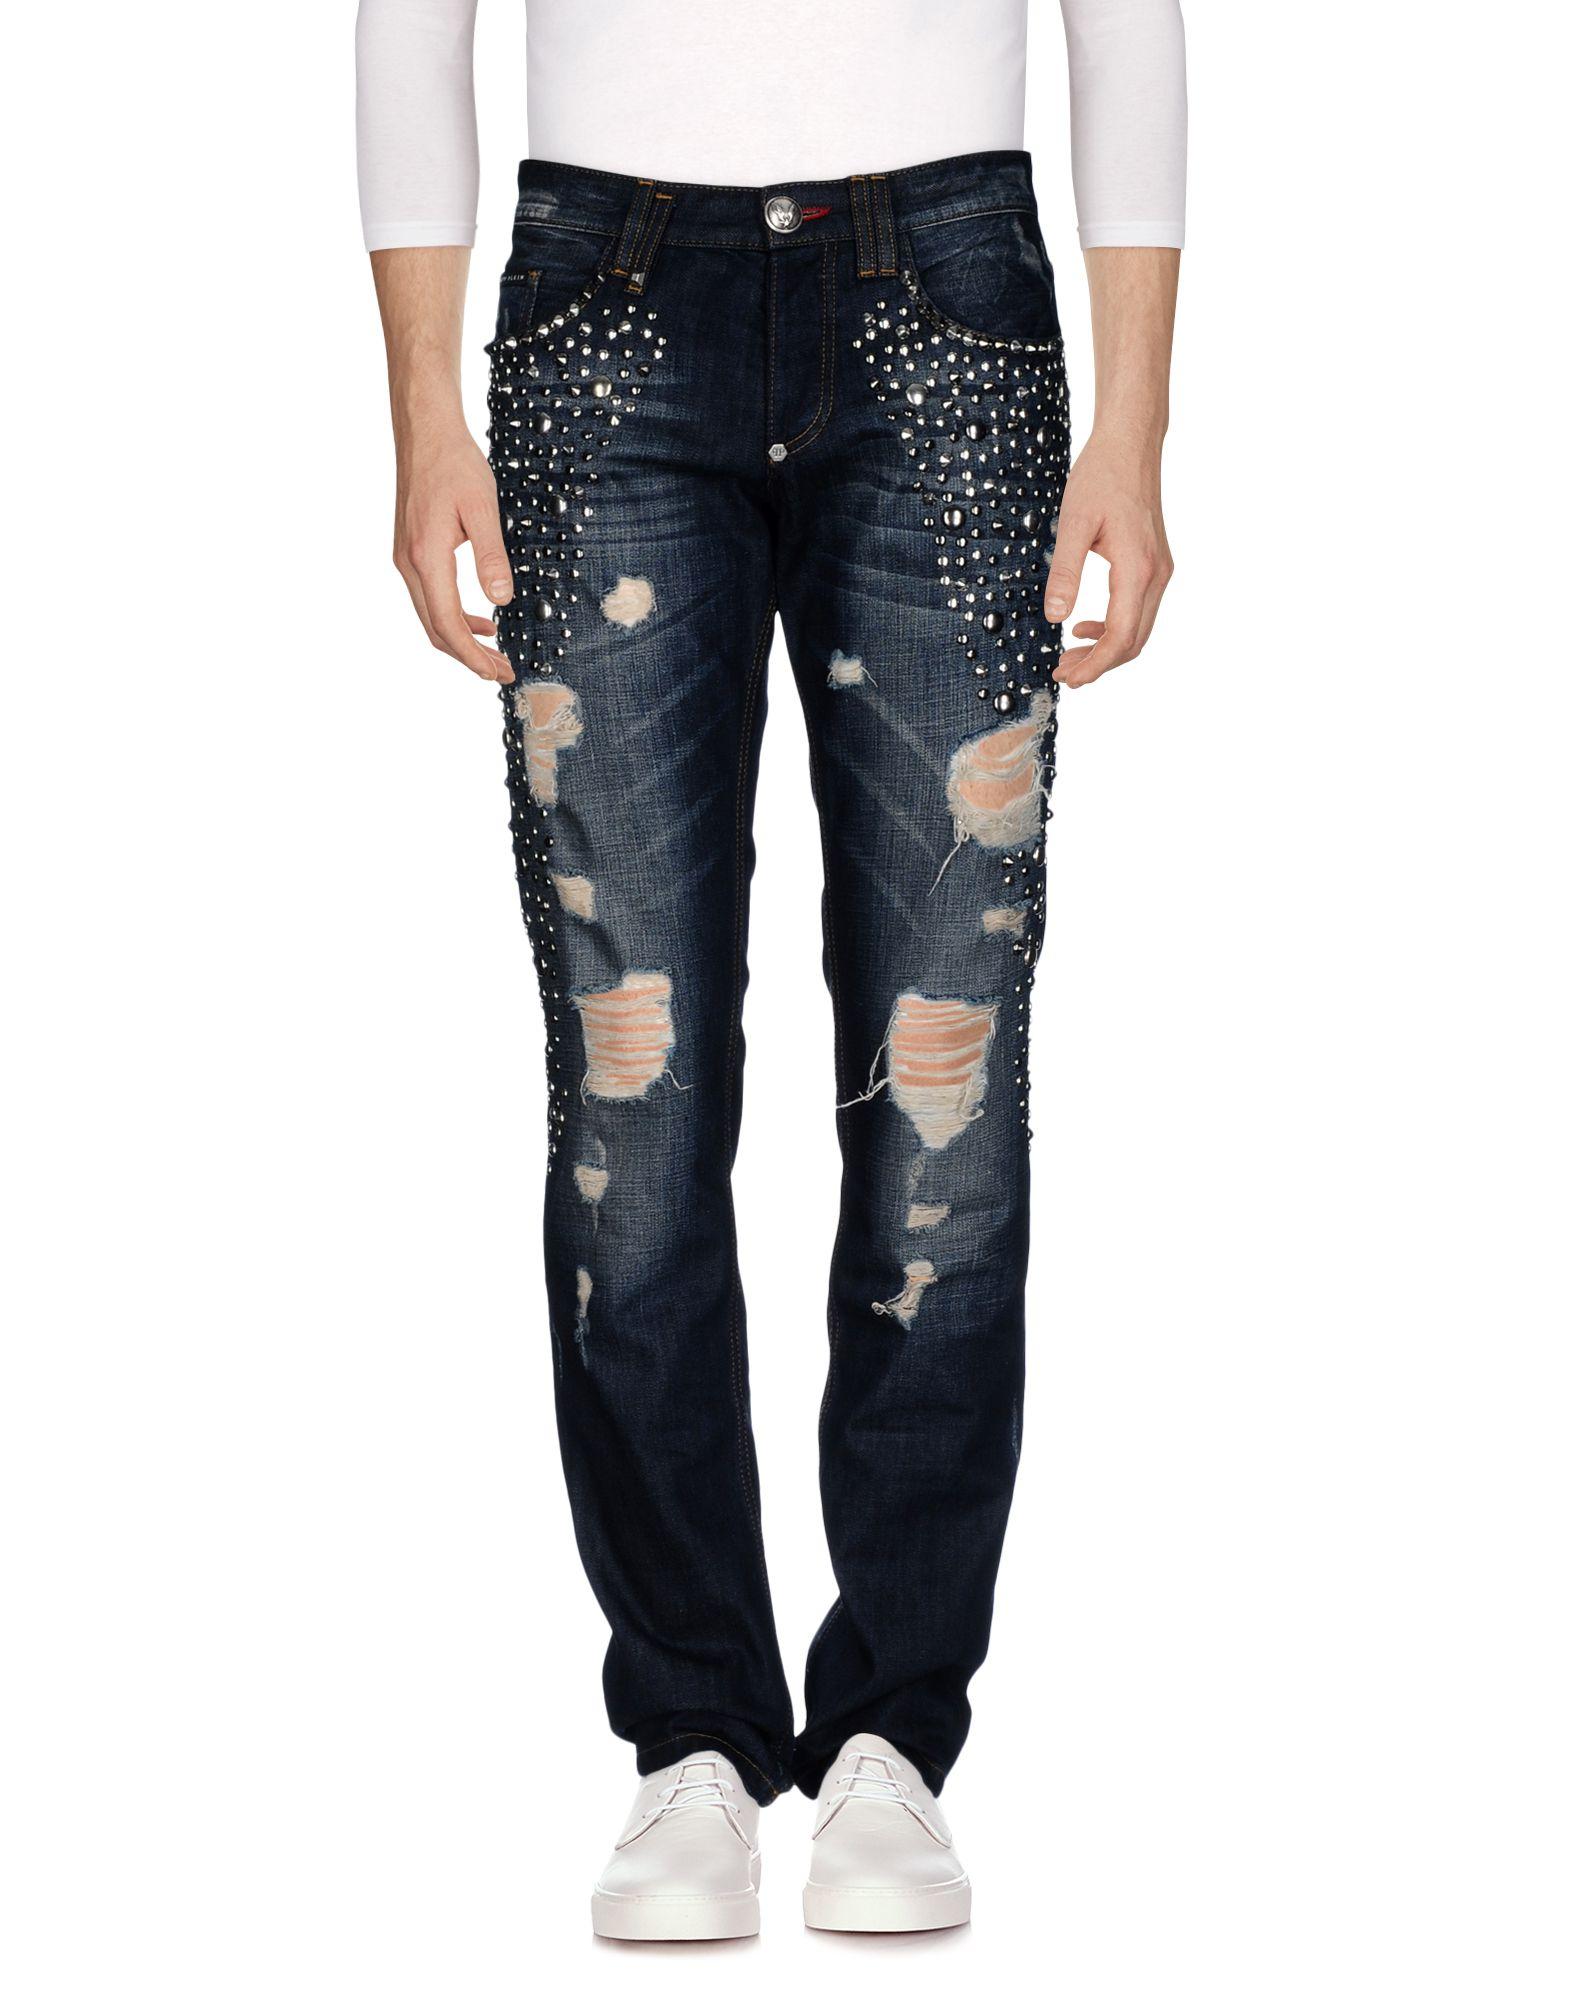 Pantaloni Jeans Philipp Plein Uomo - Acquista online su